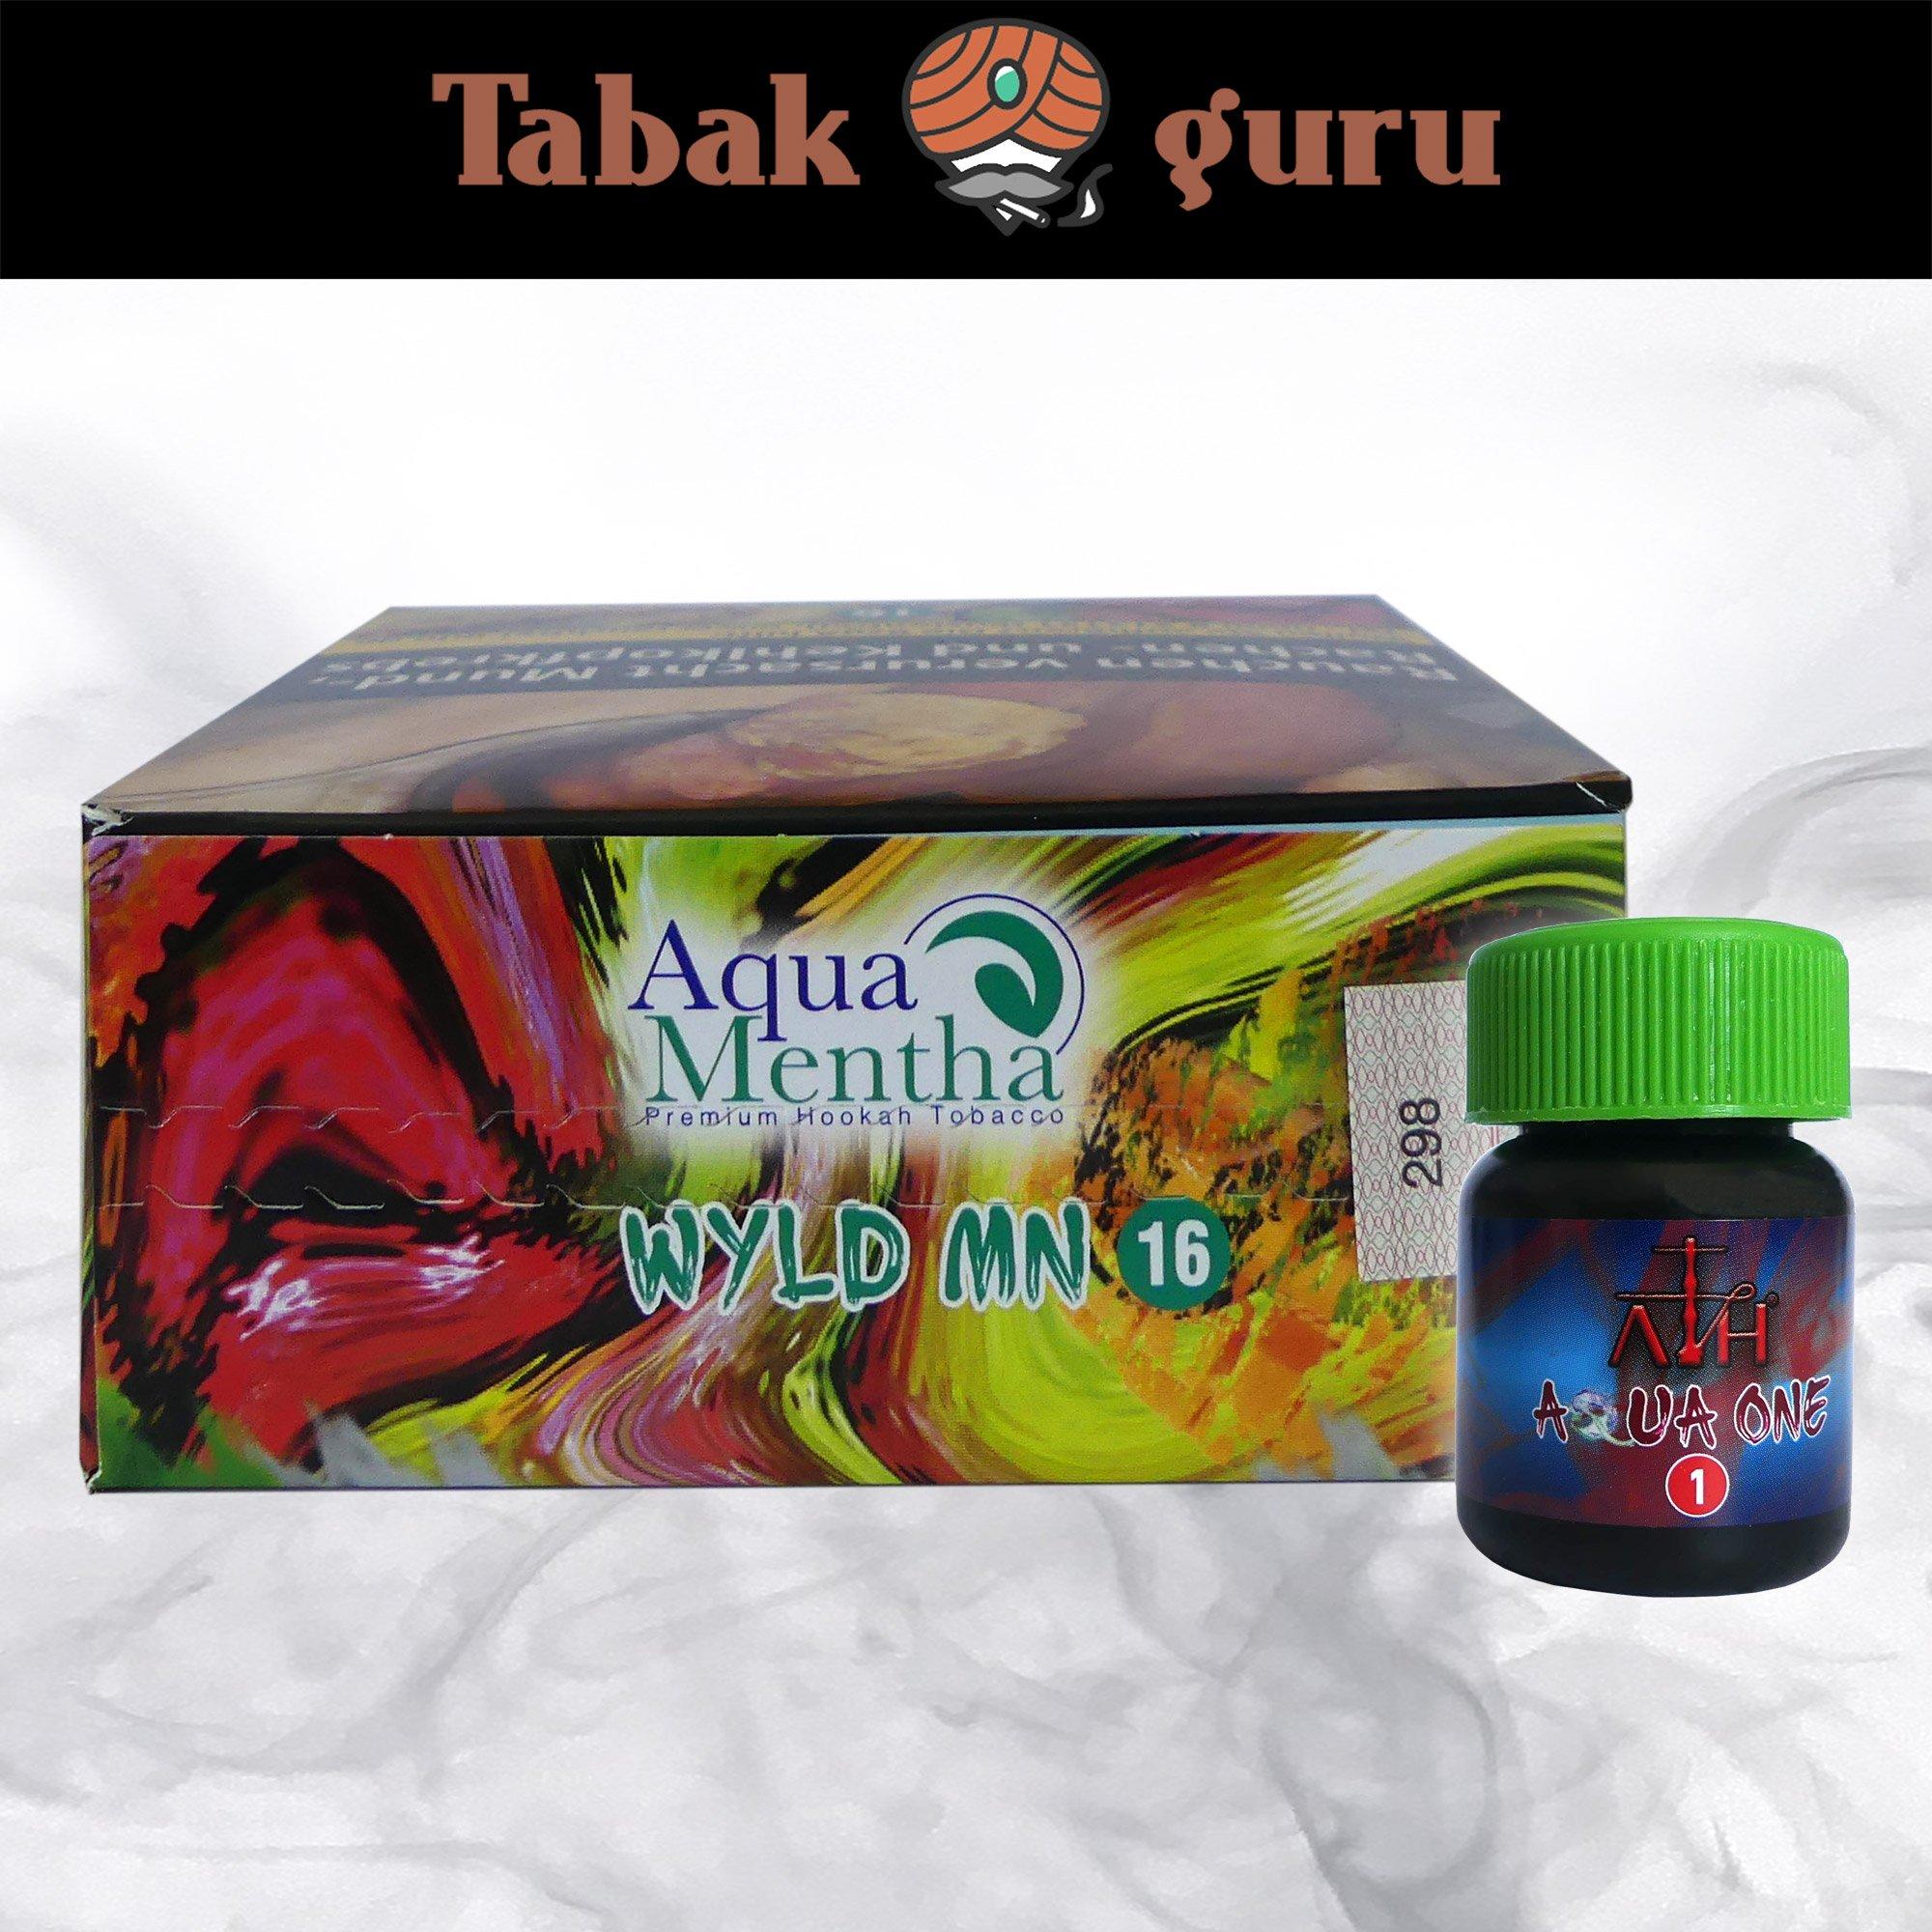 Aqua Mentha WYLD MN #16 200g Shisha Tabak + ATH Aqua One Mix